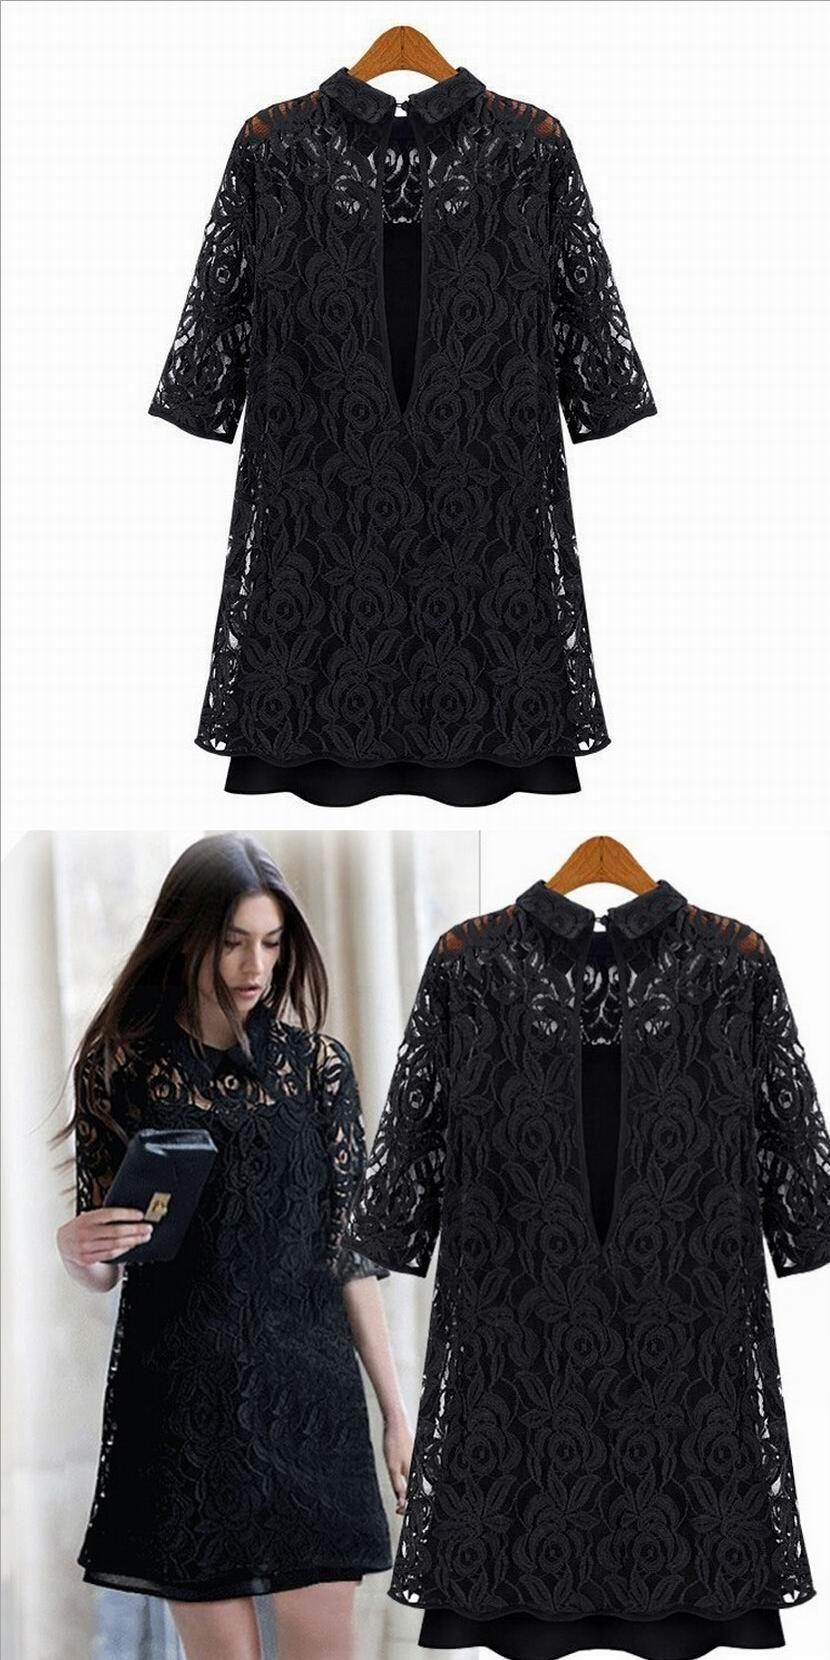 Summer Black Dress Women Plus Size Dress Office Fashion Lace Slim